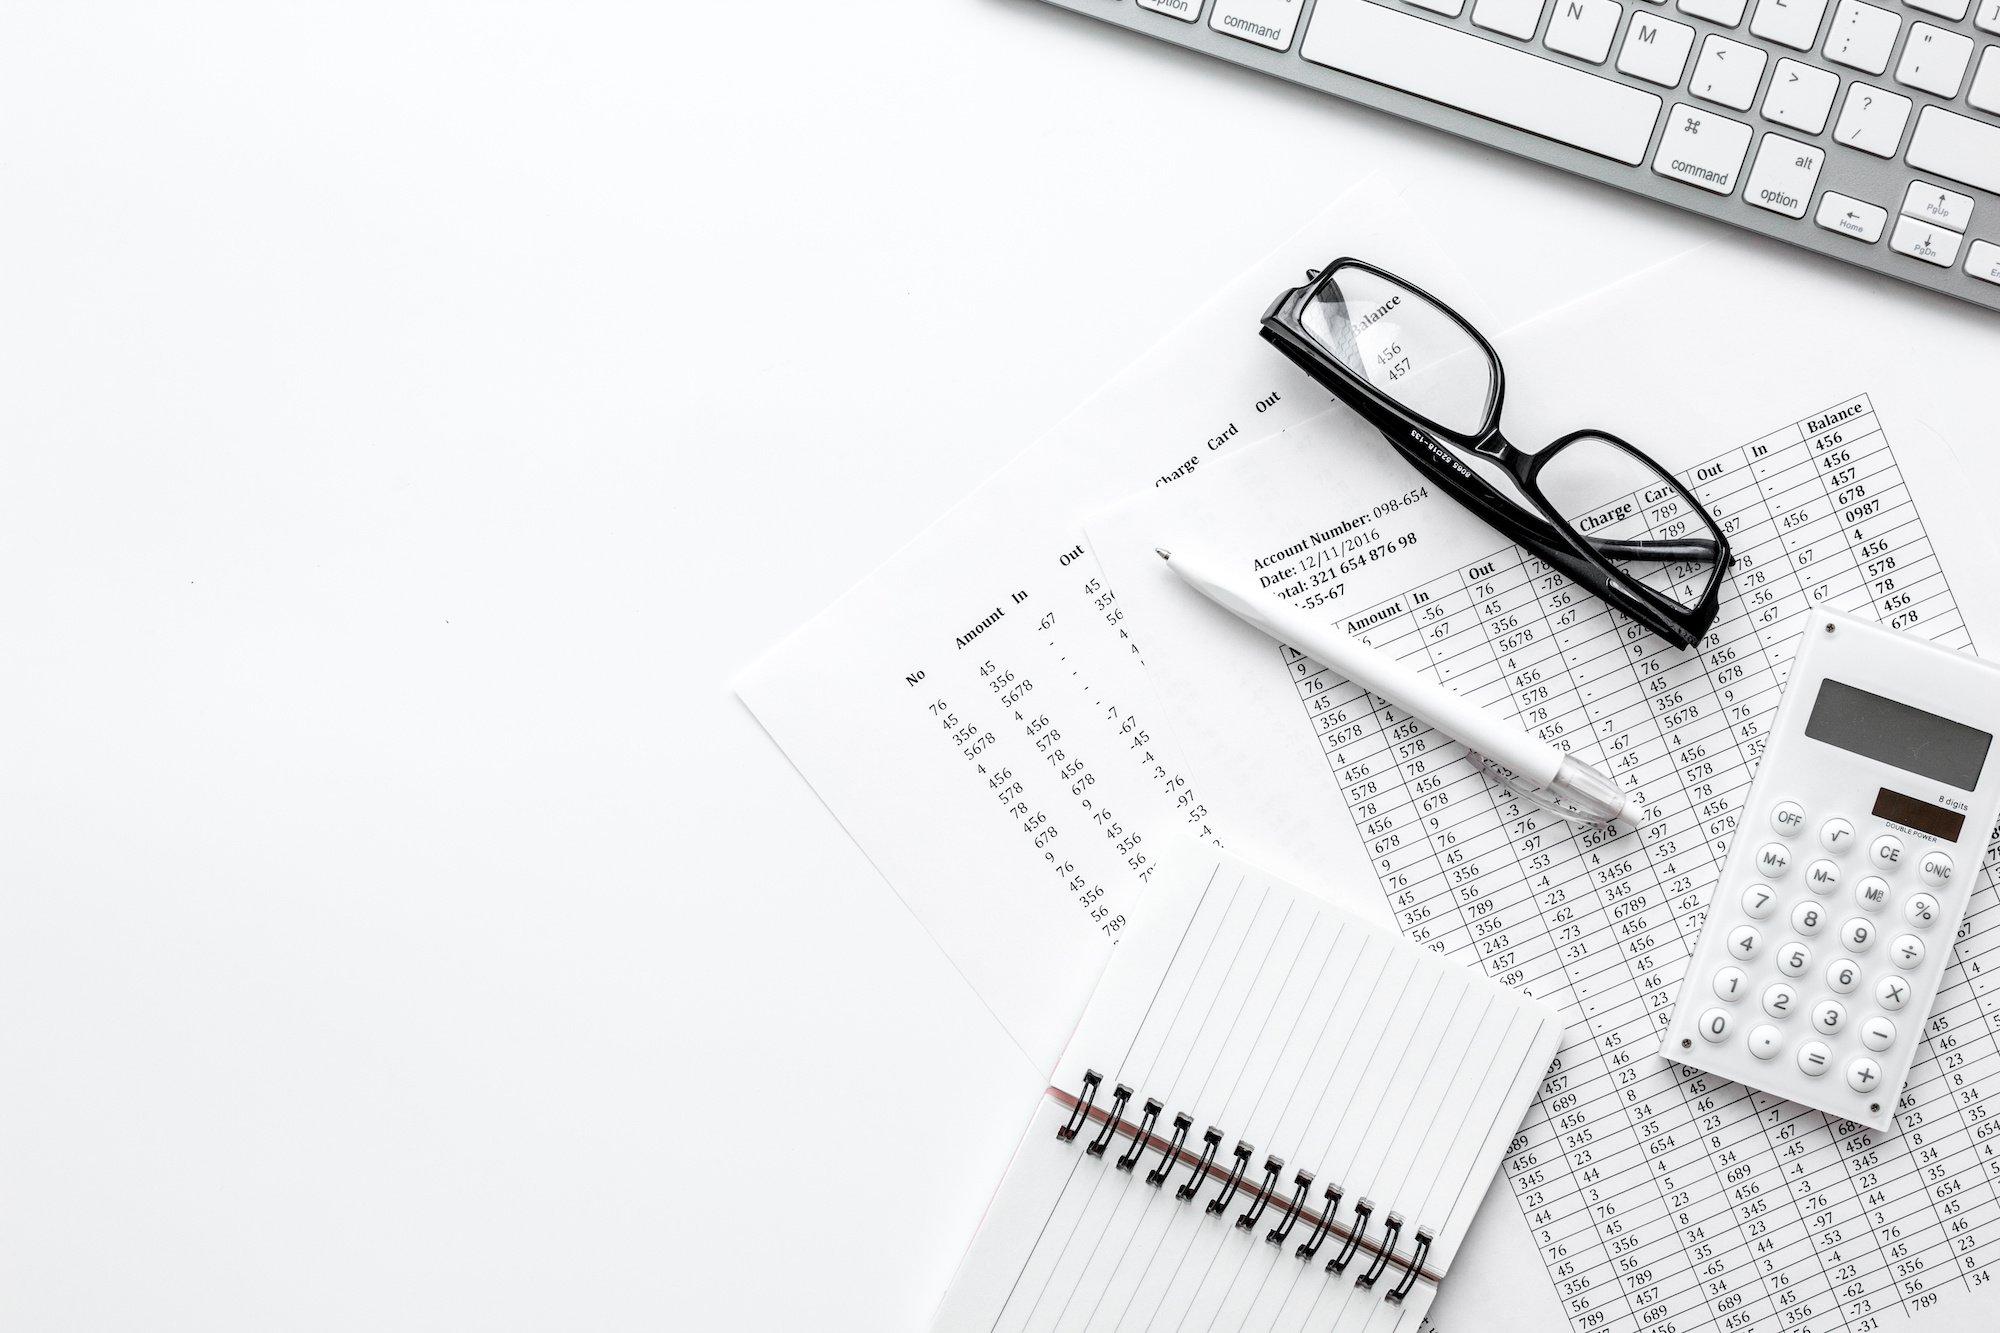 Desk - calculator - data